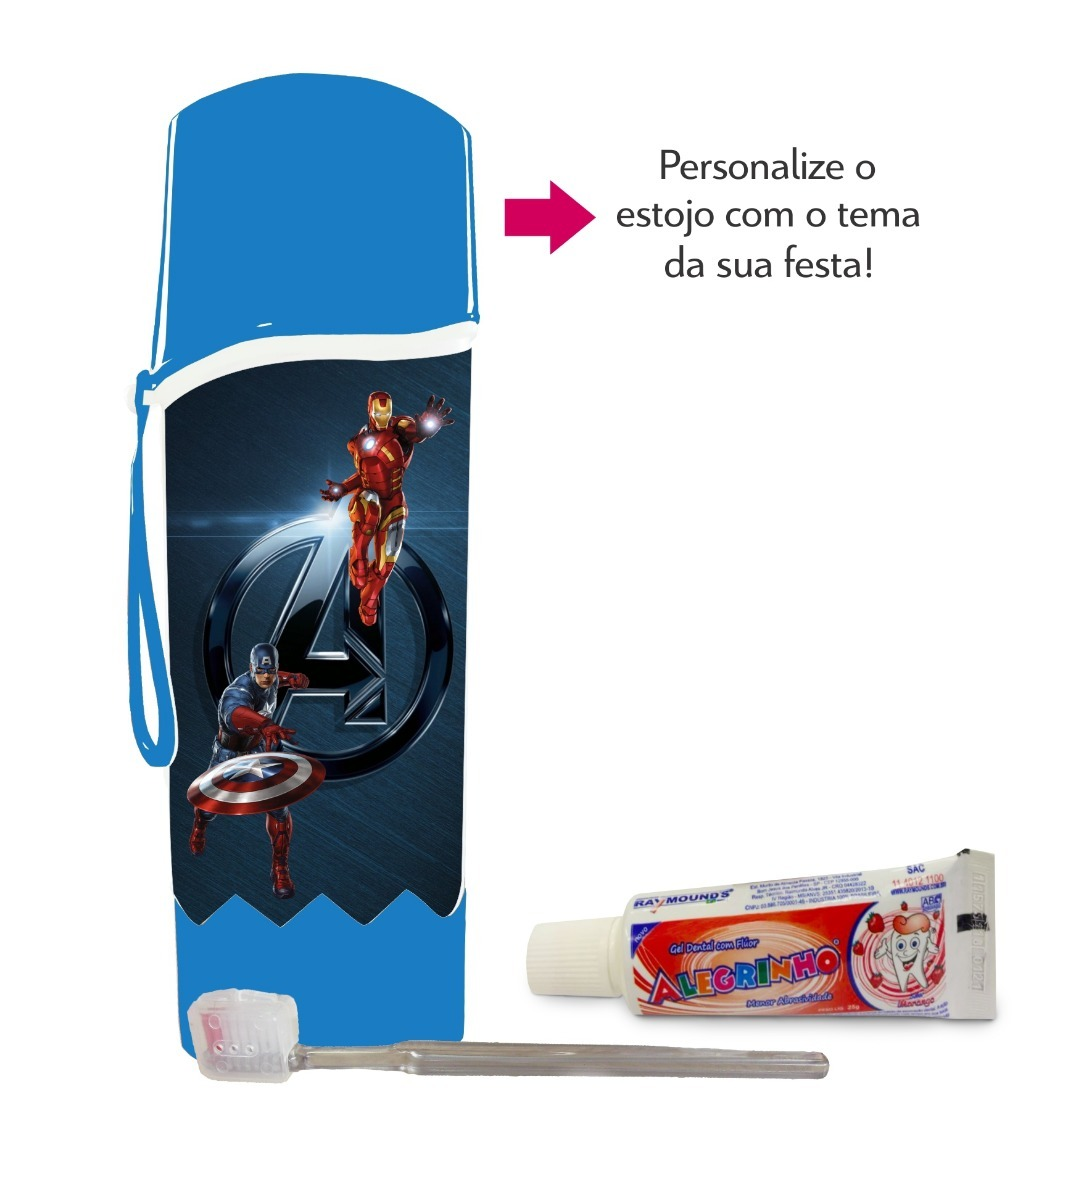 63fced4aa kit higiene bucal personalizado. Carregando zoom.